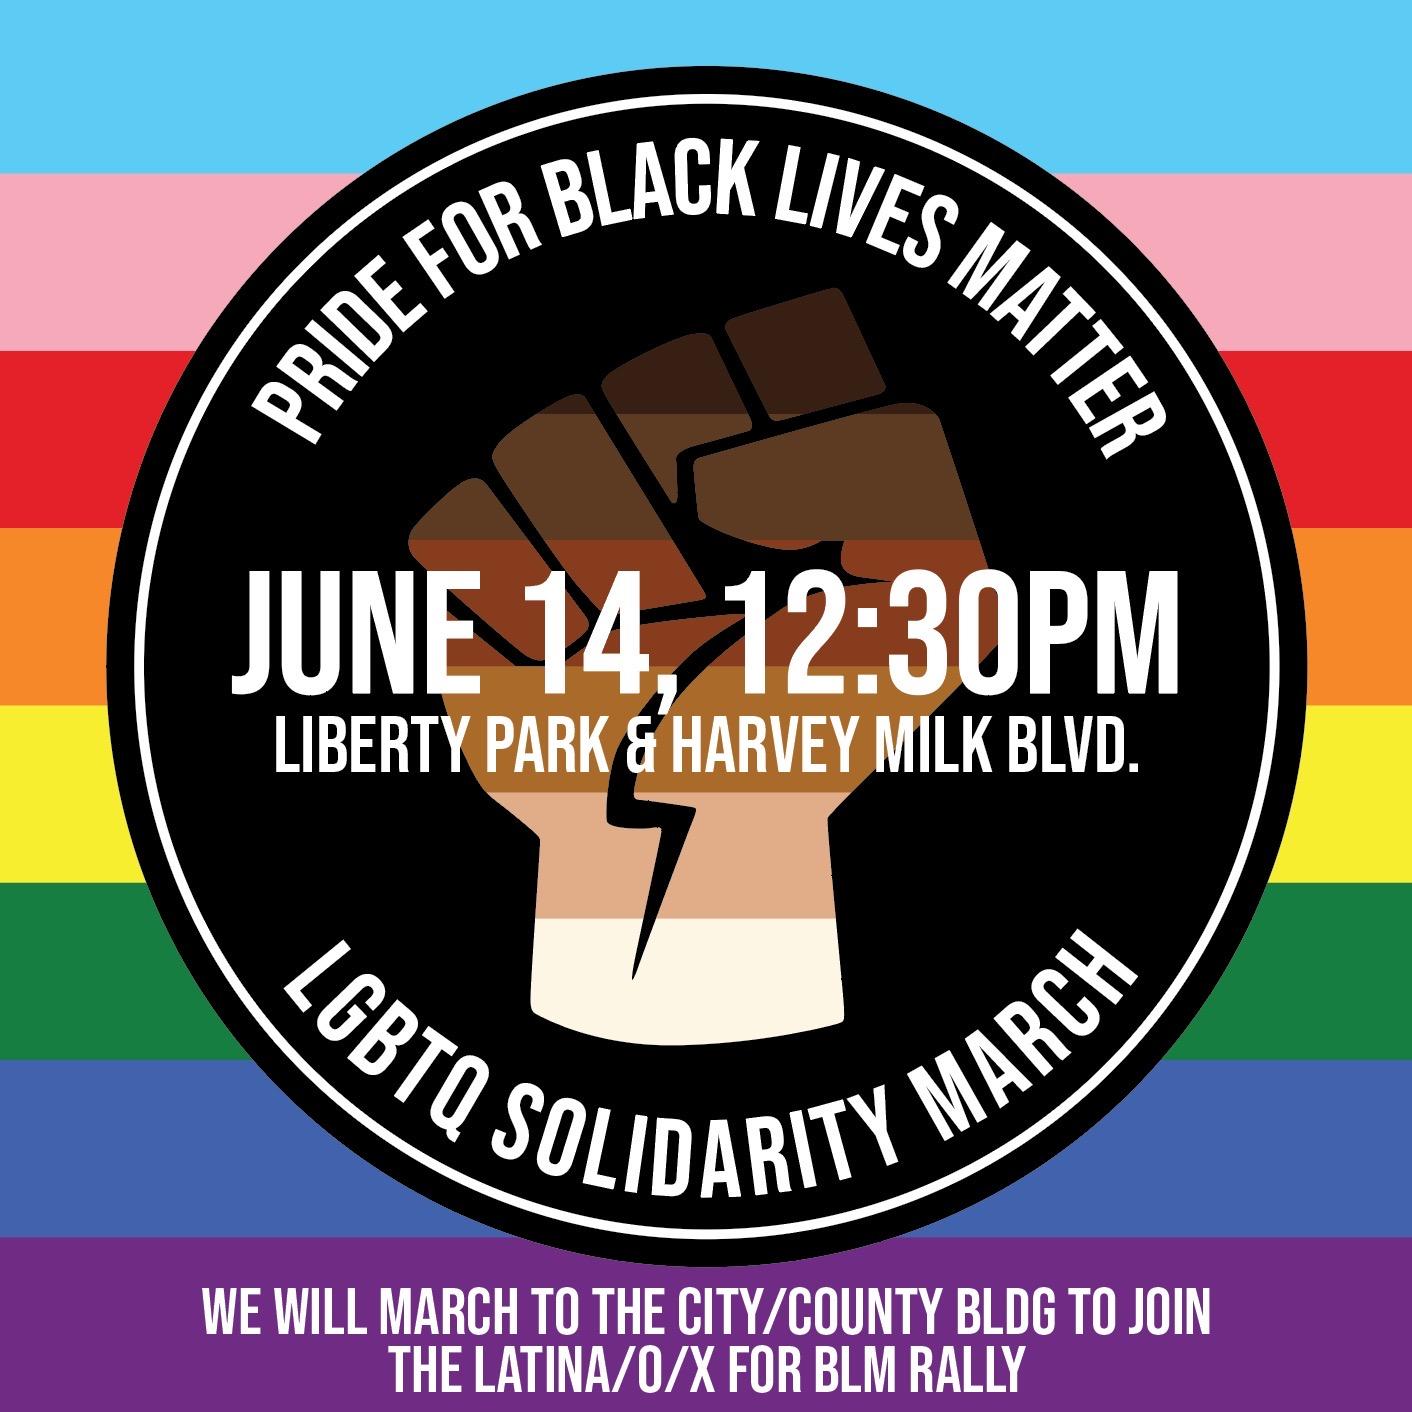 2020 Pride for Black Lives Matter LGBTQ Solidarity March Poster